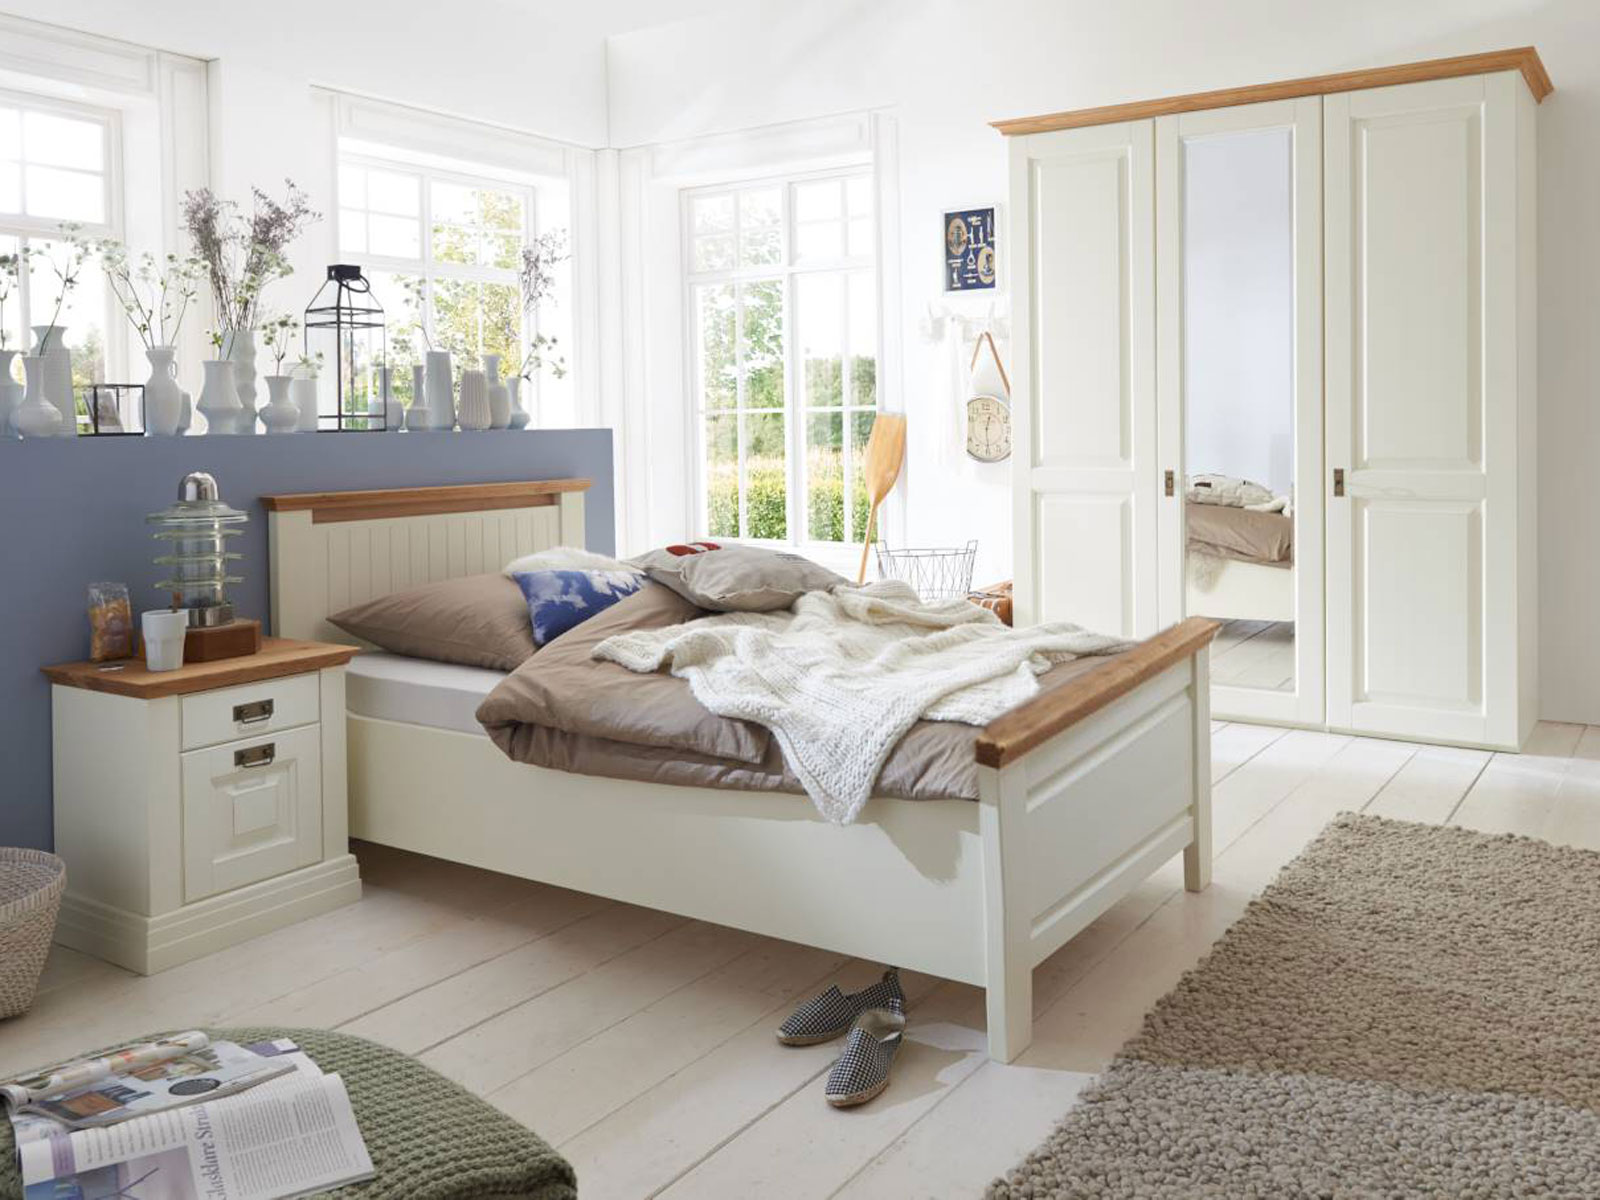 Bett Doppelbett Dreams 100 140 160 180 200 X 200 Cm Aus Pinie